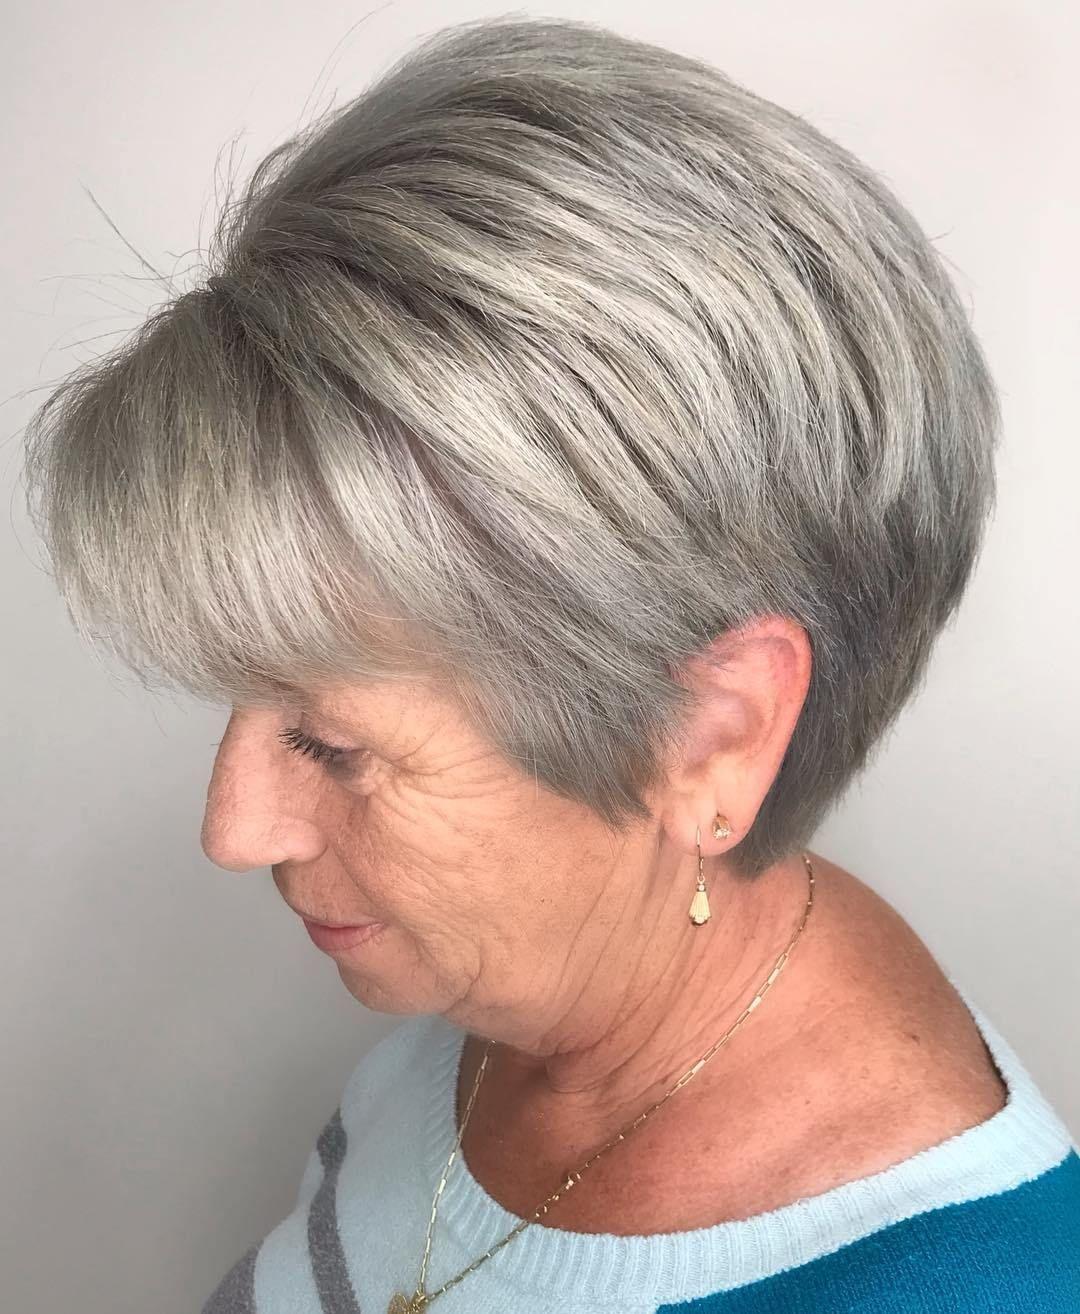 12 Gray Hair Styles to Get Instagram-Worthy Looks in 12 in 12